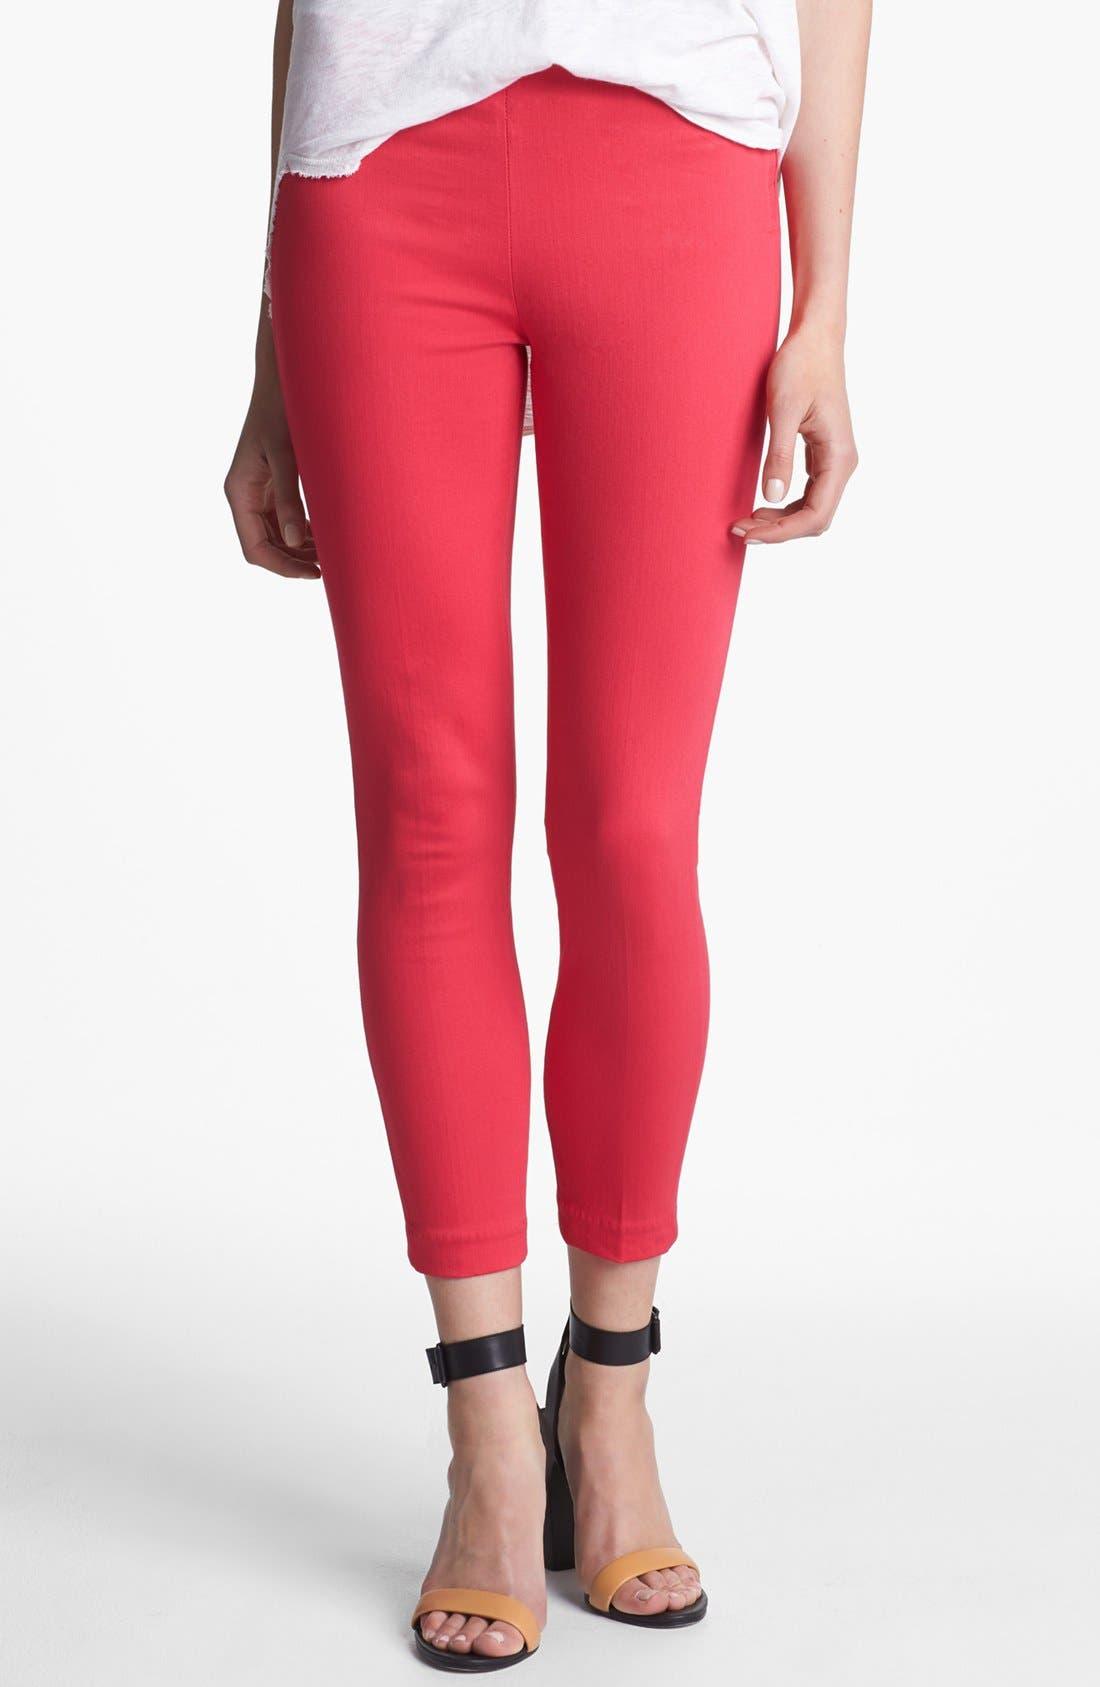 Main Image - J Brand 'Clean' Stretch Capri Pants